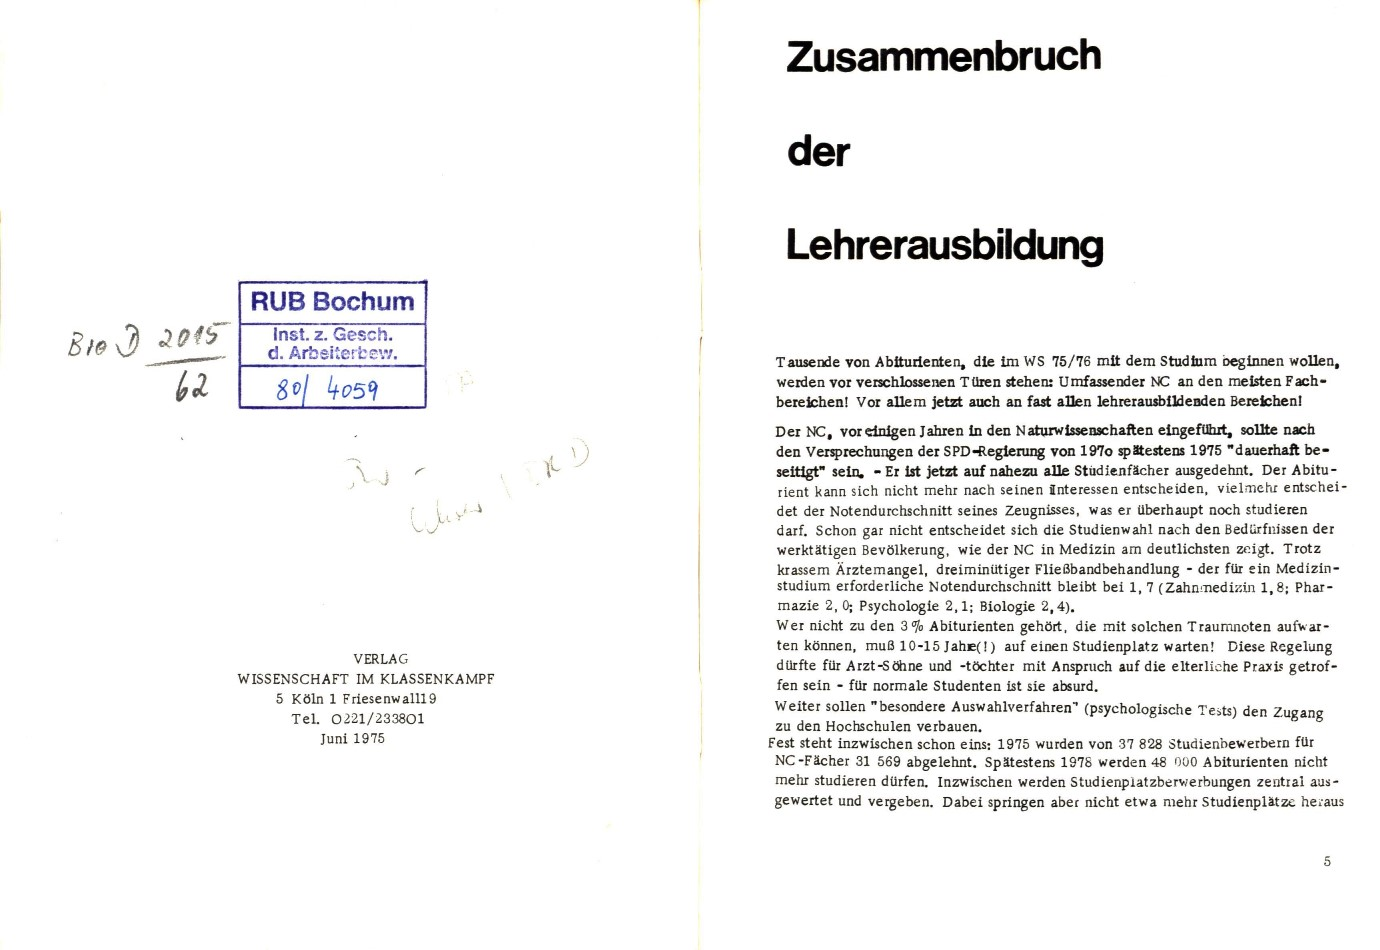 KSV_1975_Lehrerausbildung_03